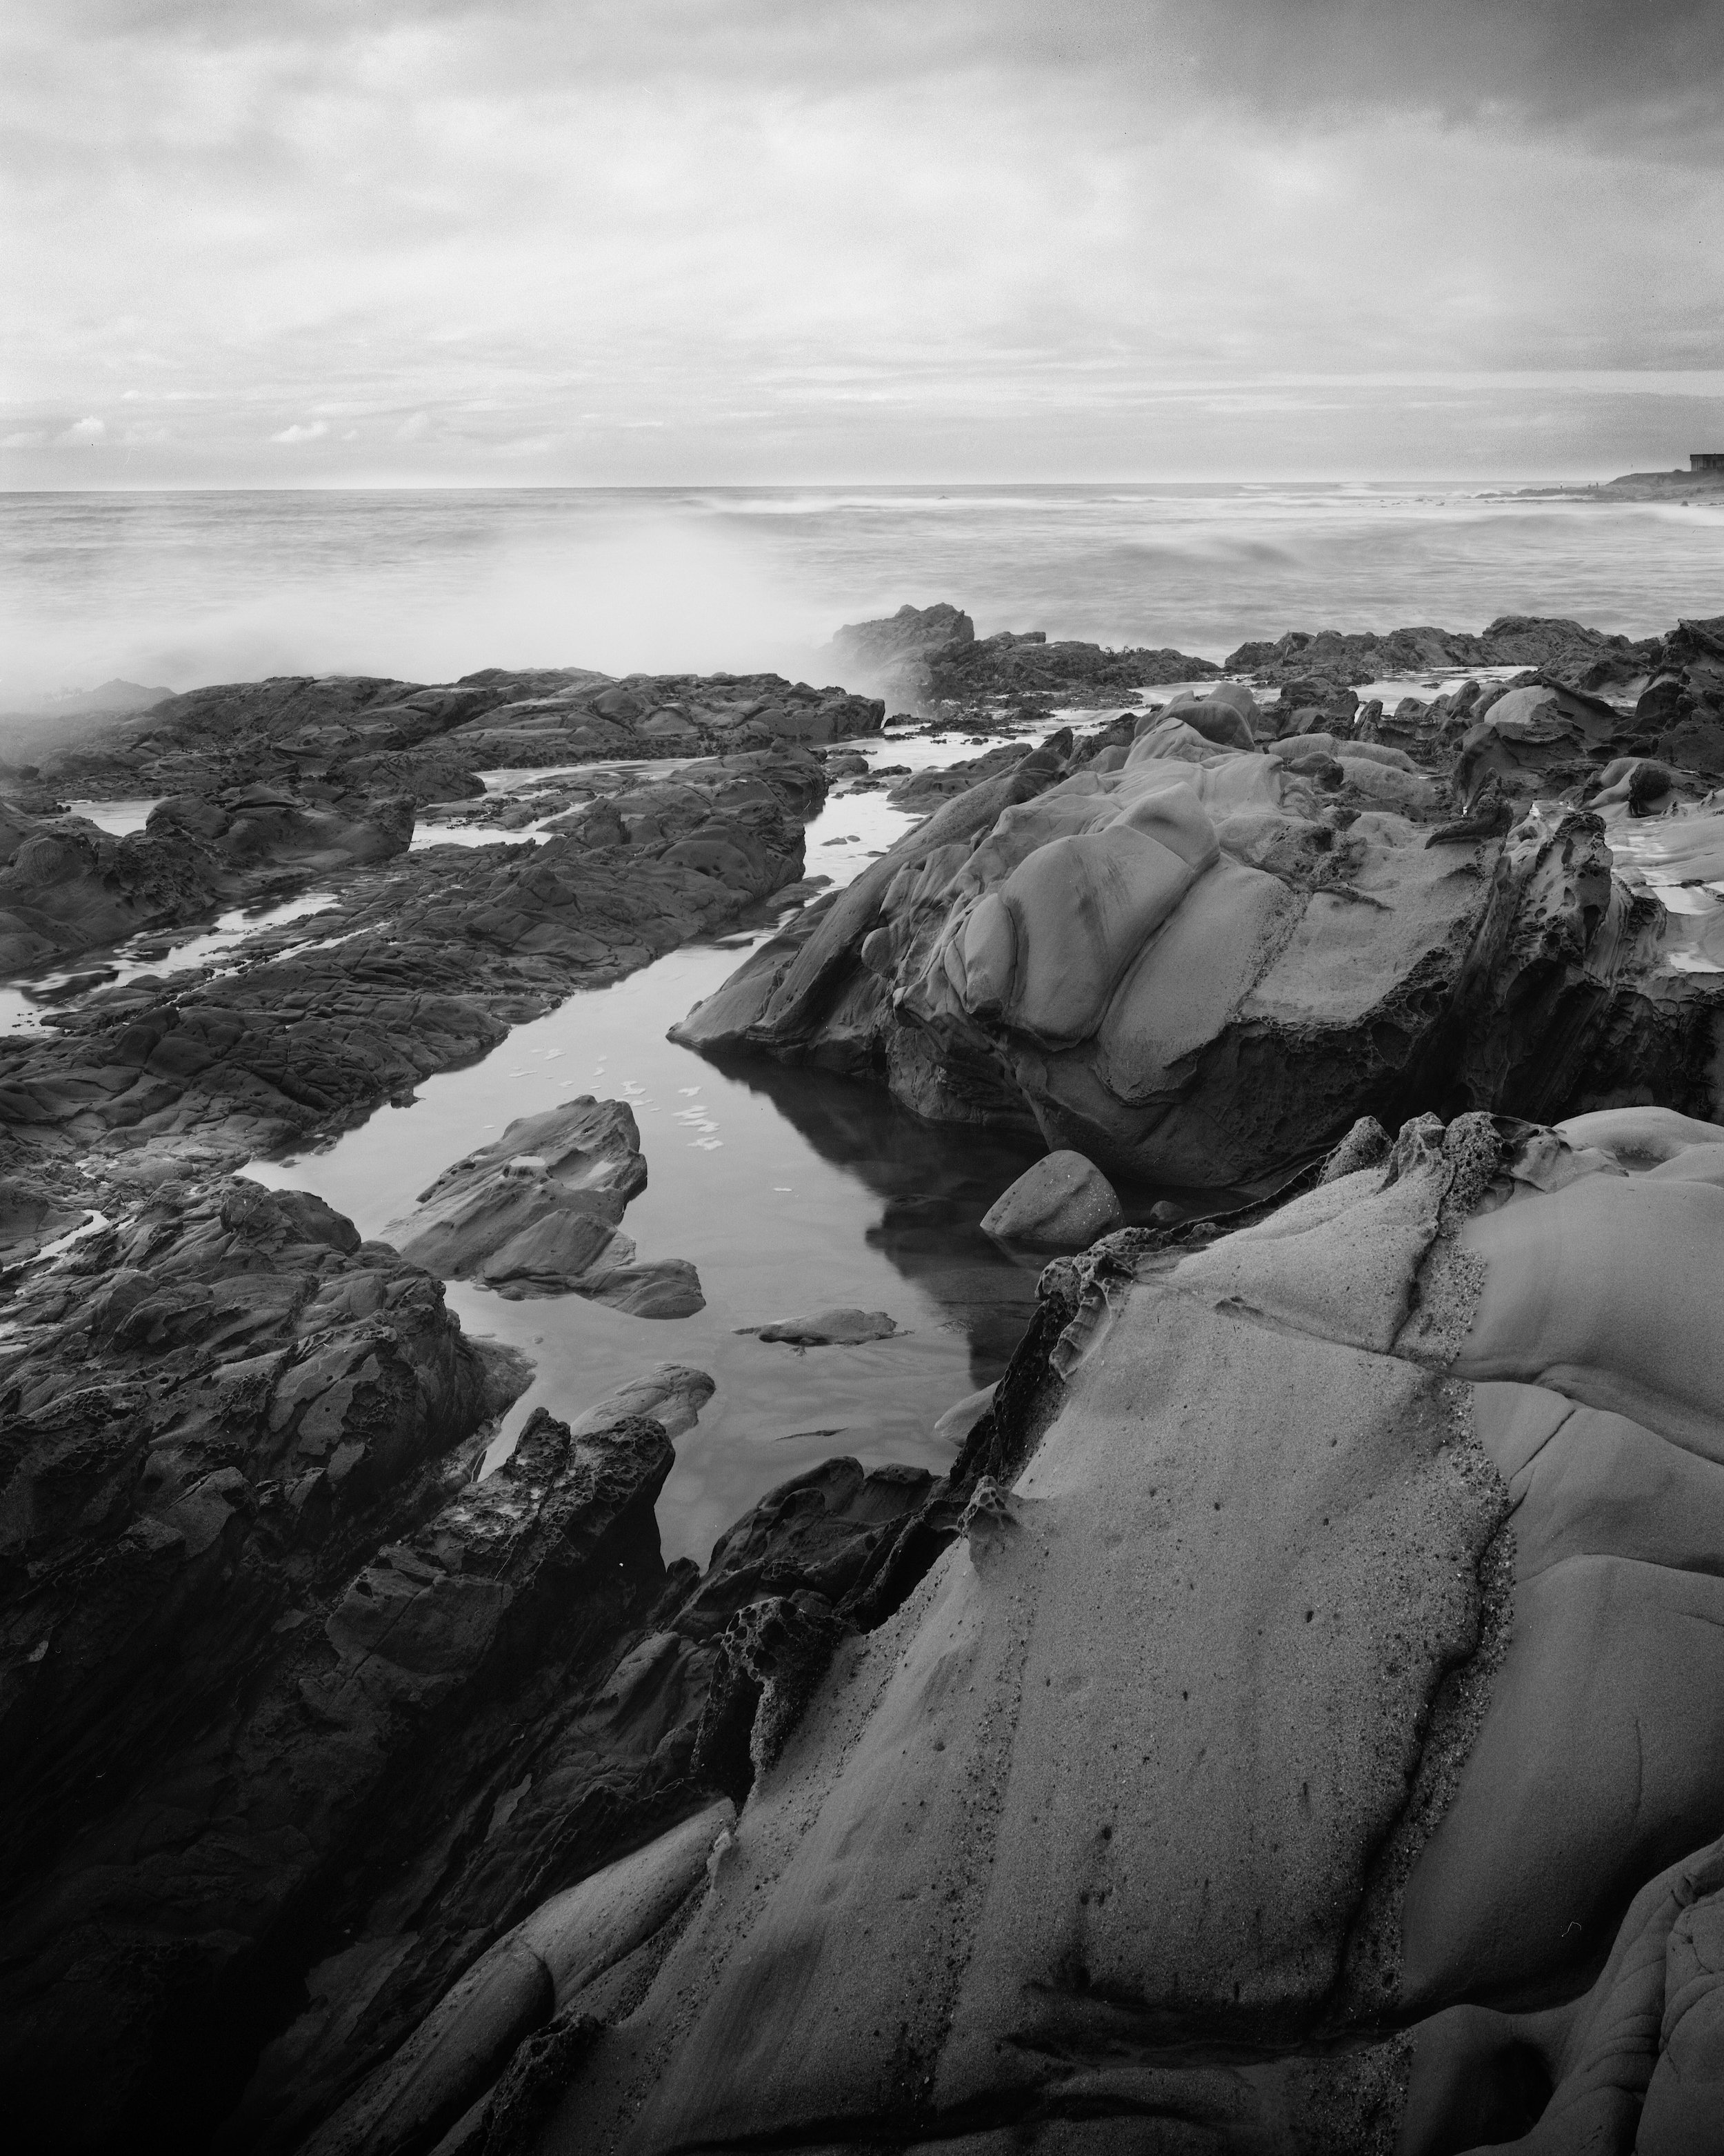 Surf breaking over tidepools. Nagaoka 4x5, Fujinon 125mm f/5.6, Ilford Delta 100